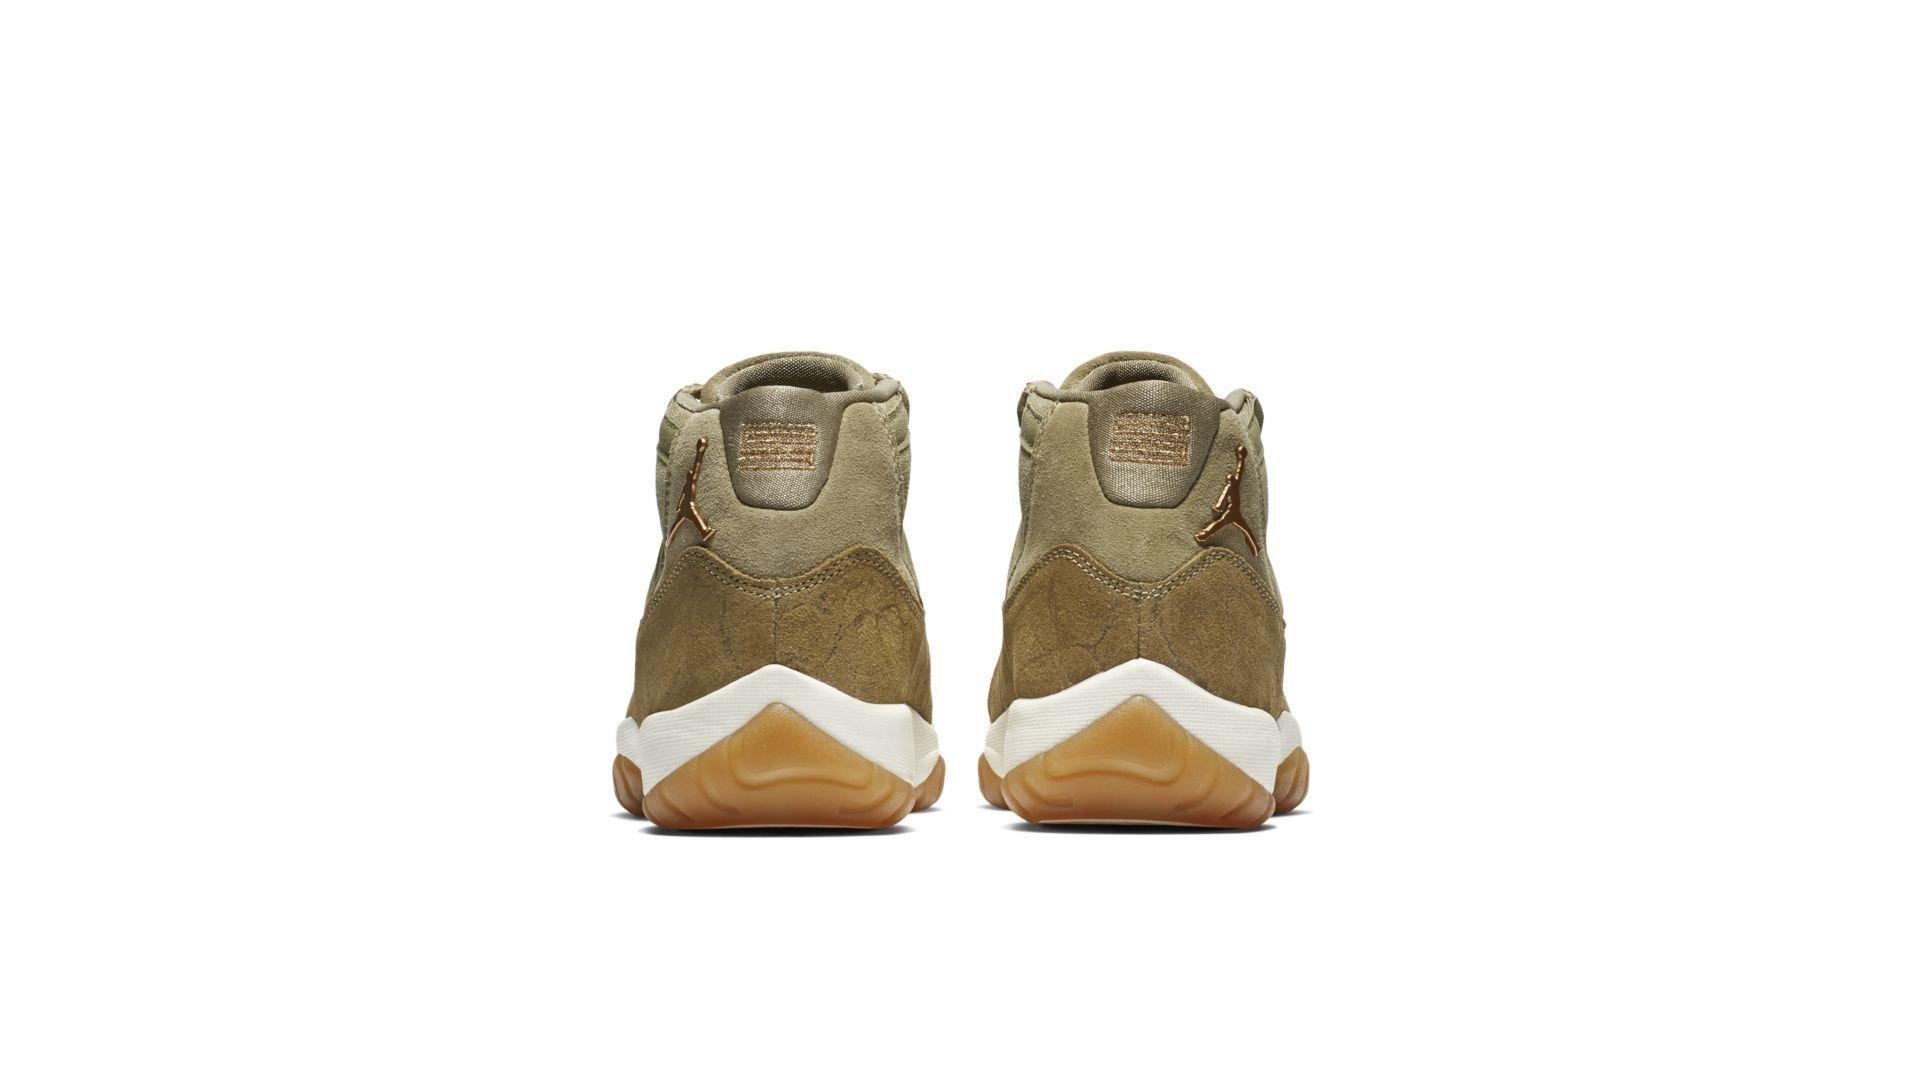 Jordan 11 Retro Neutral Olive (W) (AR0715-200)